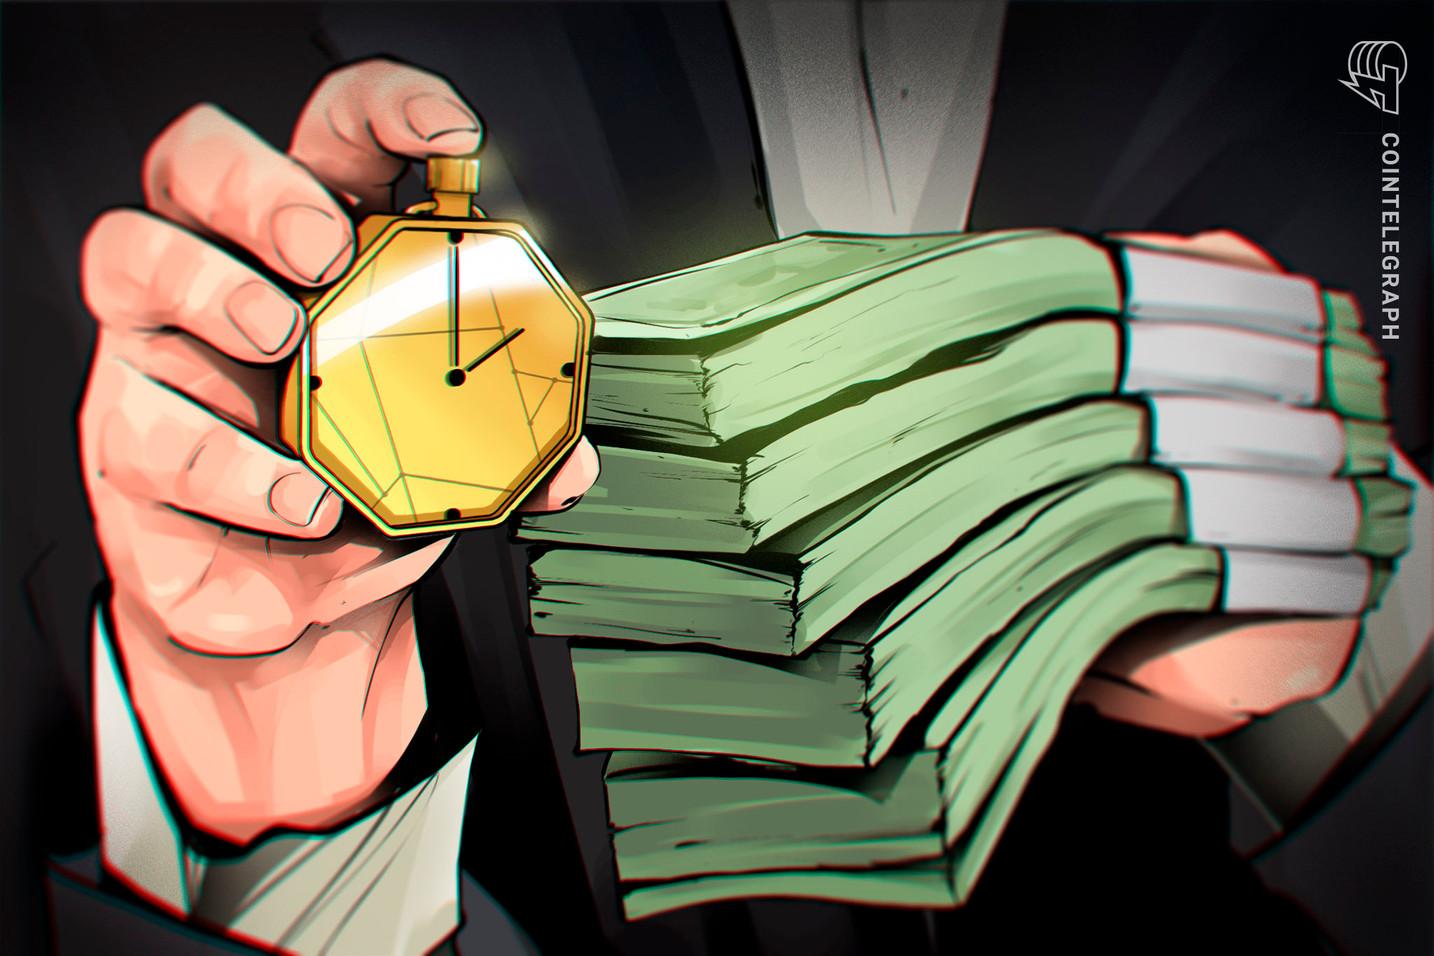 Magic Internet Money市值突破10亿美元,与MakerDao形成竞争